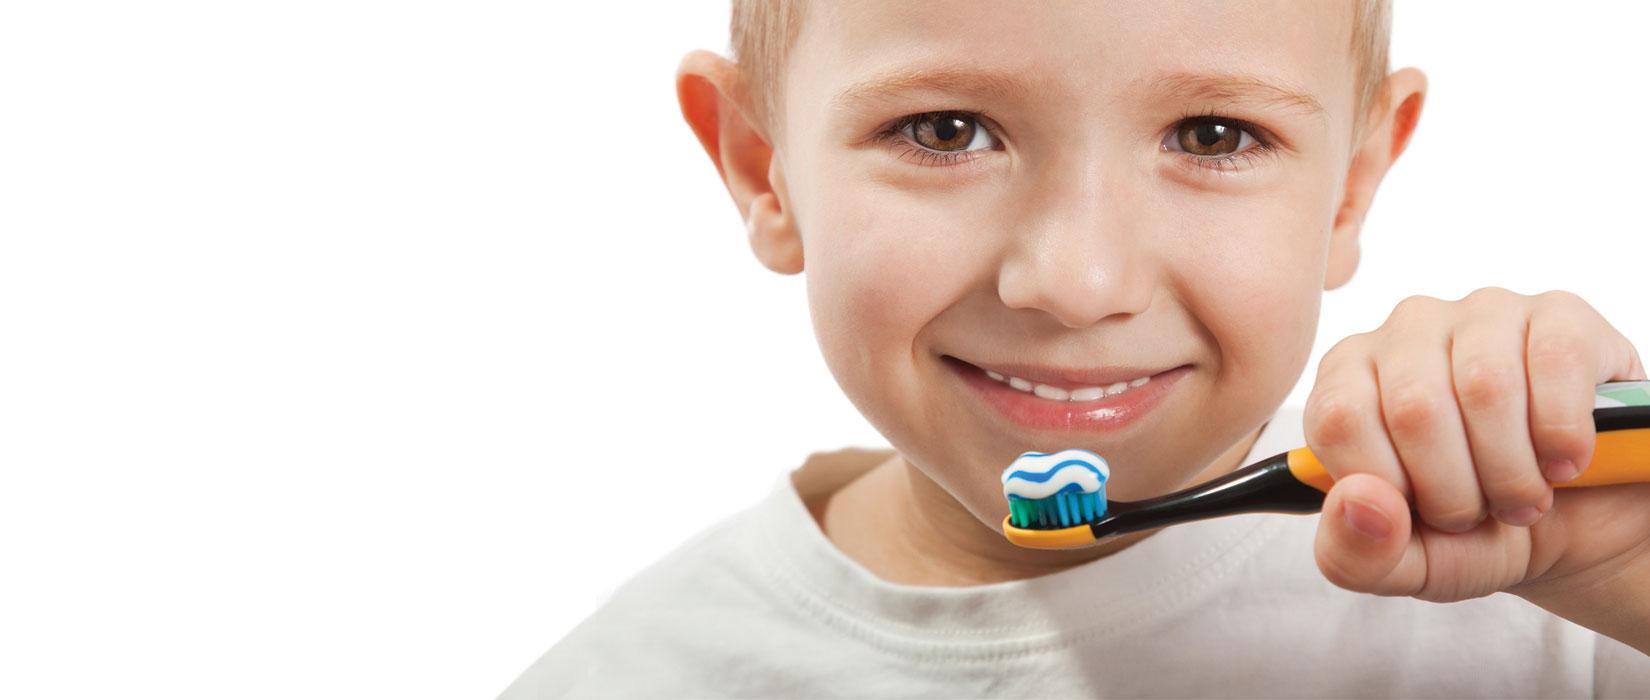 pediatric-dentist-phoenix-85014